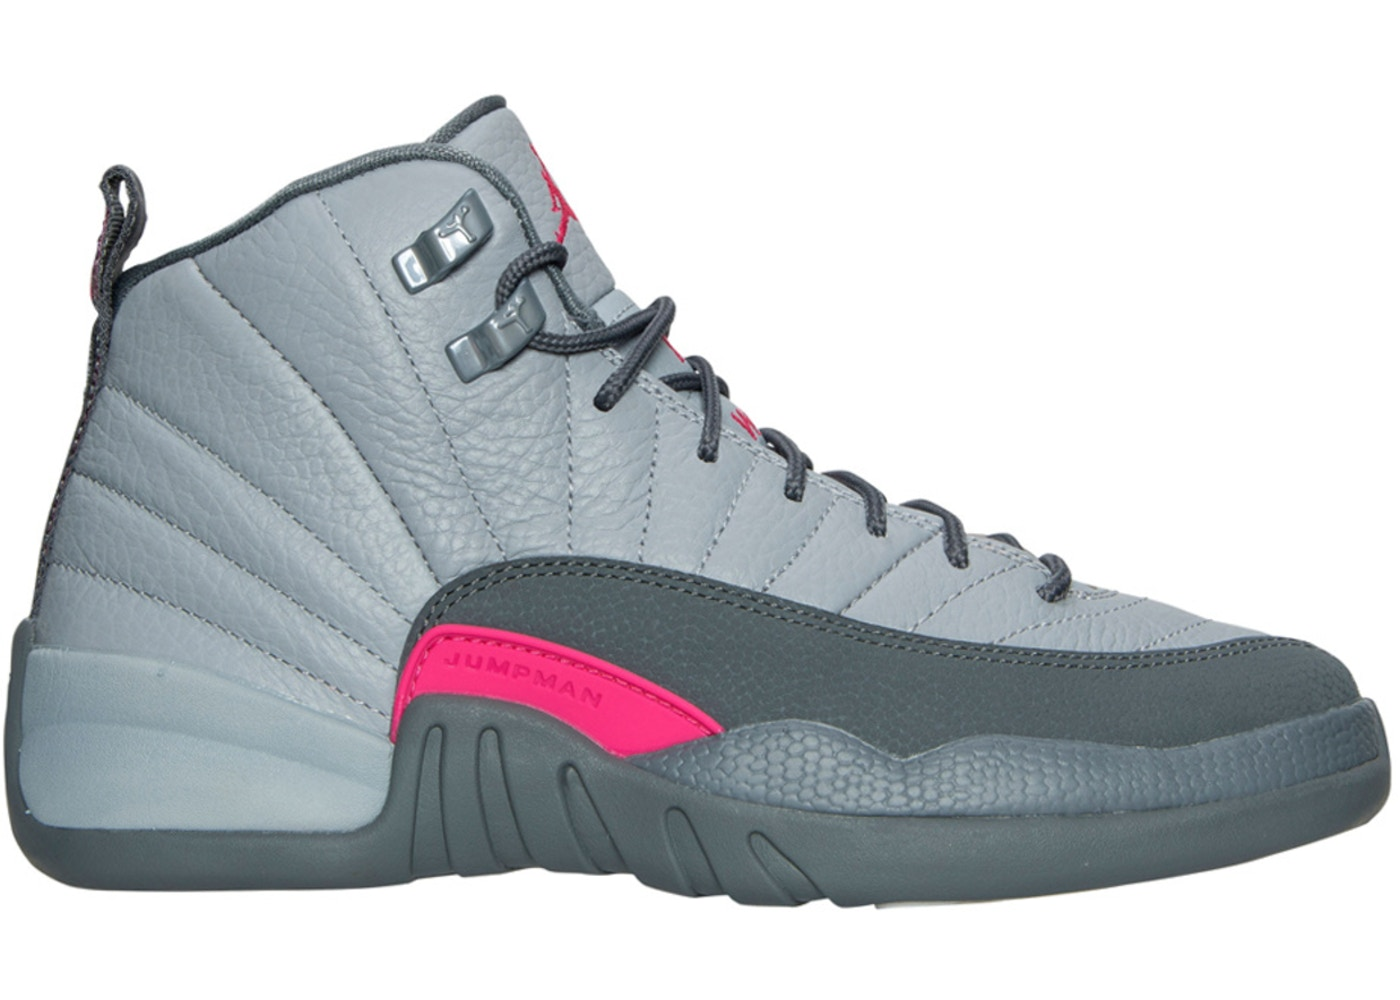 huge discount 3f122 49230 Jordan 12 Retro Wolf Grey Vivid Pink (GS)